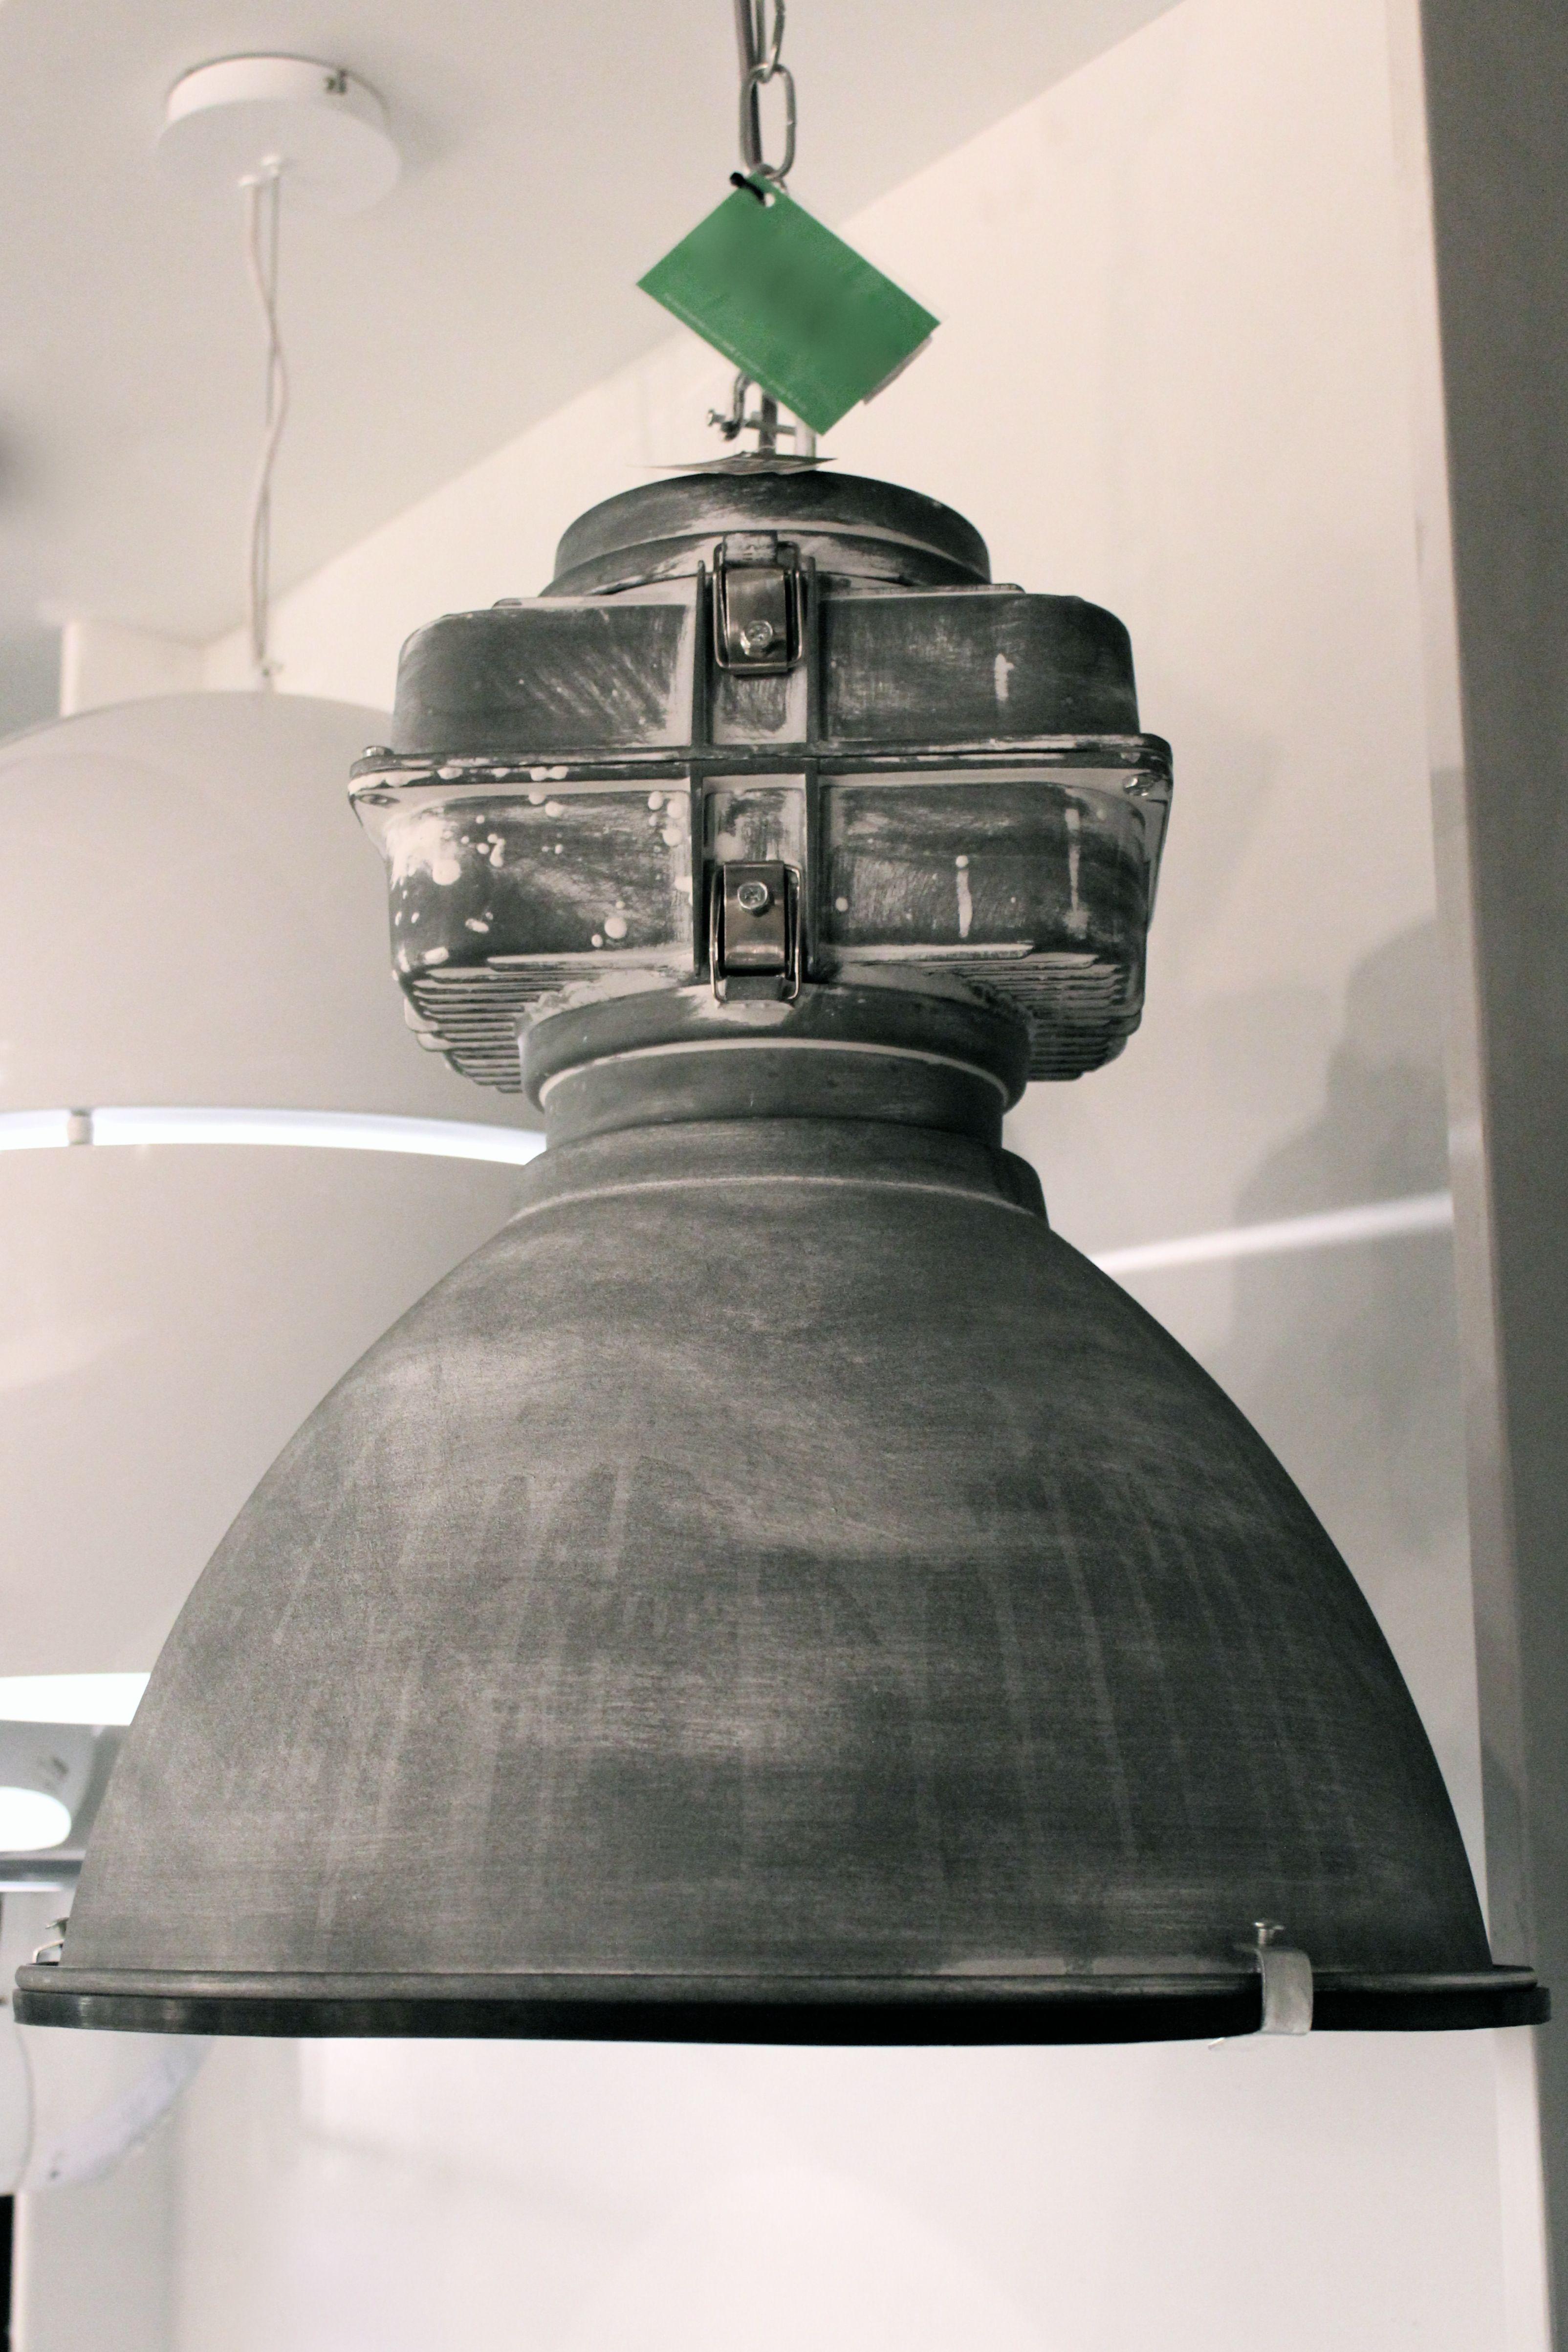 Met, Lamps and Van on Pinterest